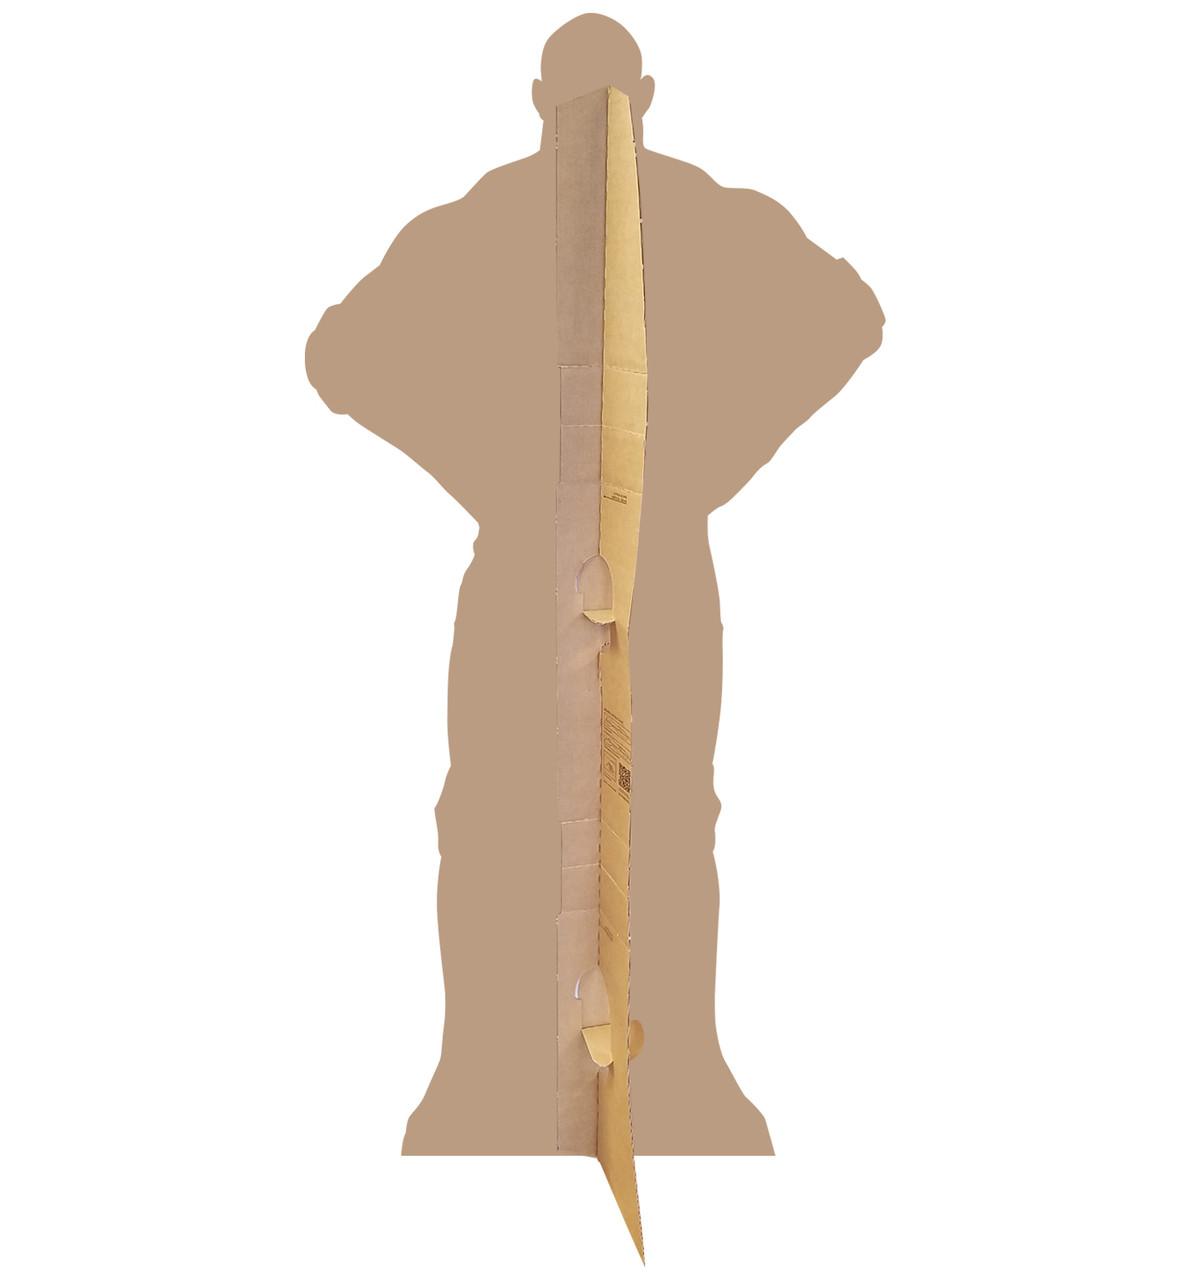 Life-size Goldberg - WWE Cardboard Standup | Cardboard Cutout 2